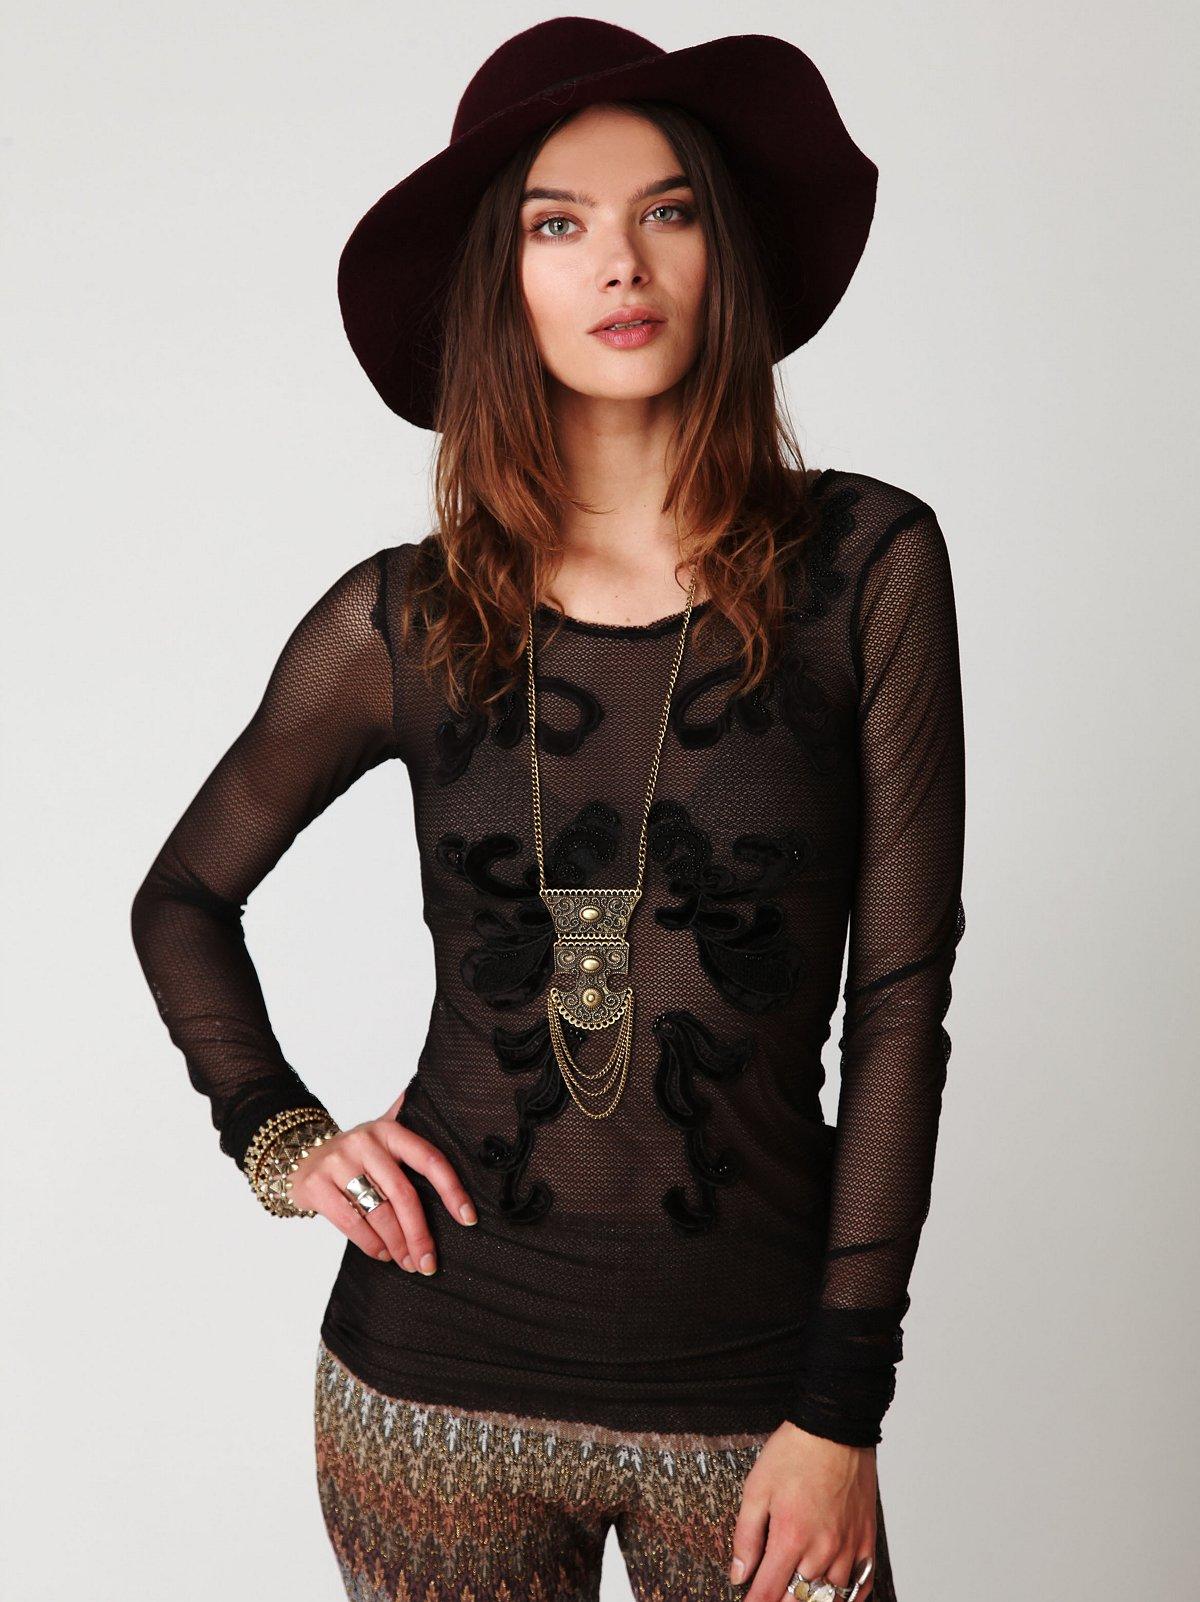 Gypsy Emperor Embellished Long Sleeve Top